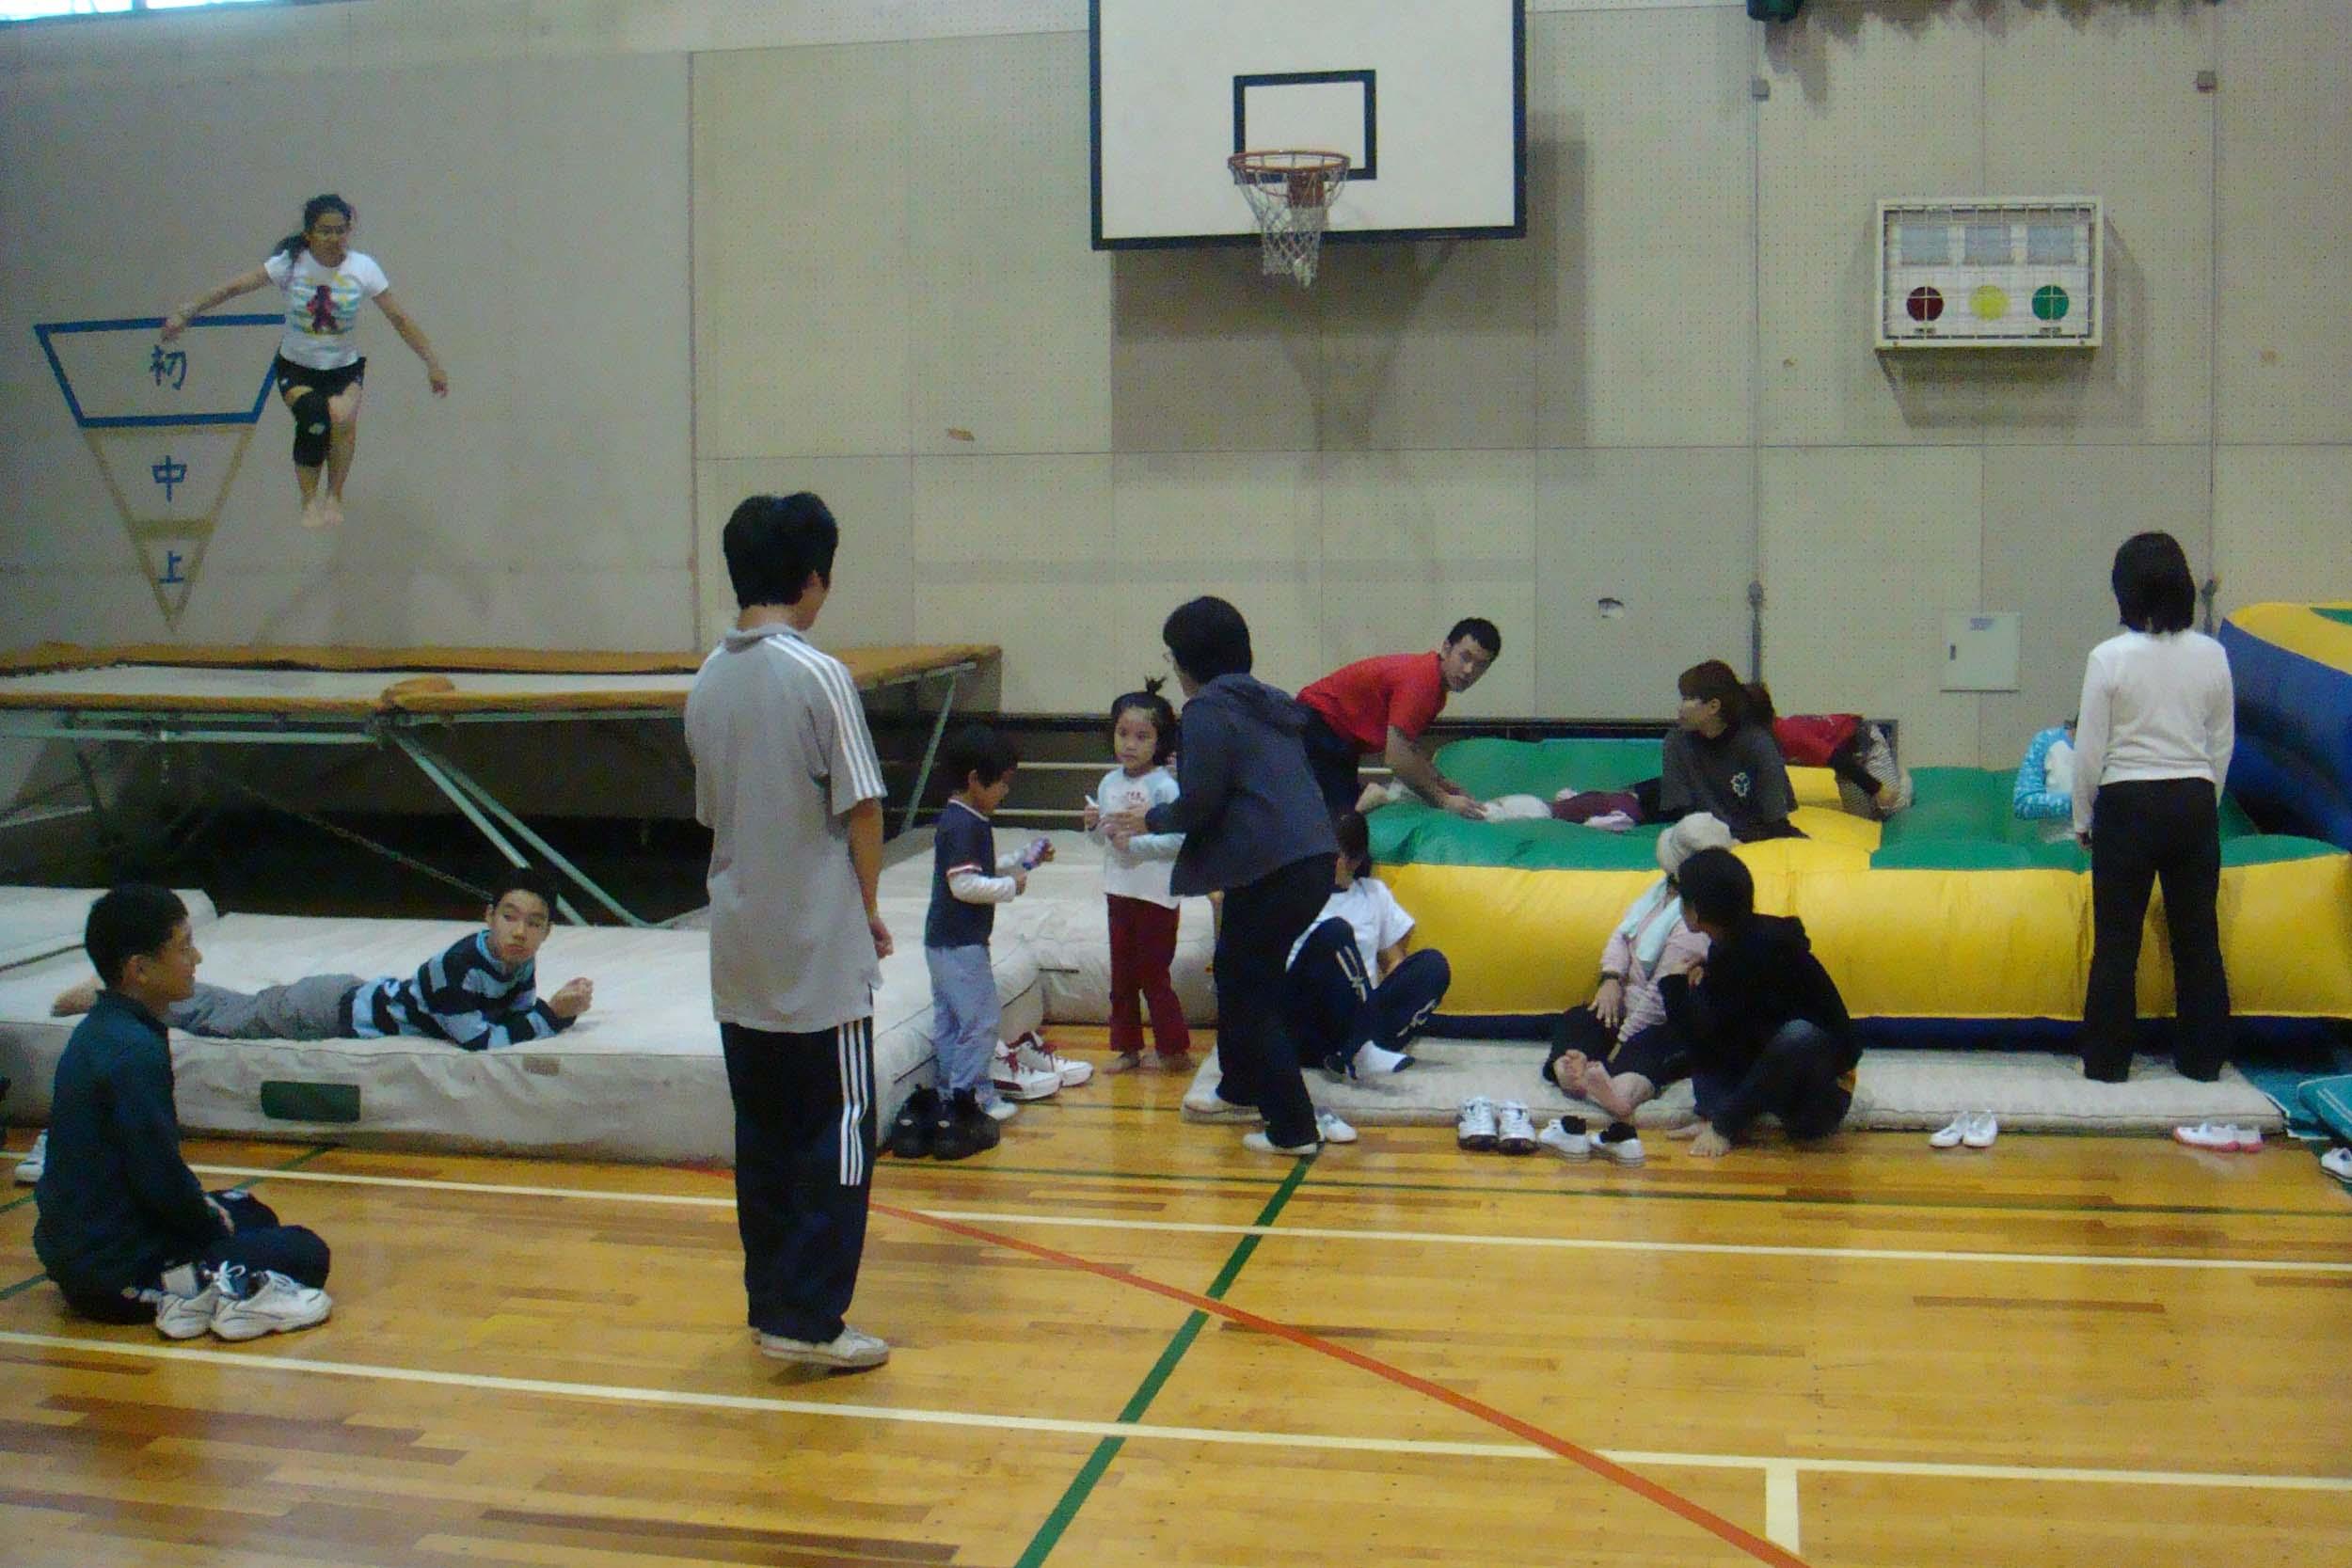 yousu - トランポリン教室より・・・笑顔でジャンプ!!